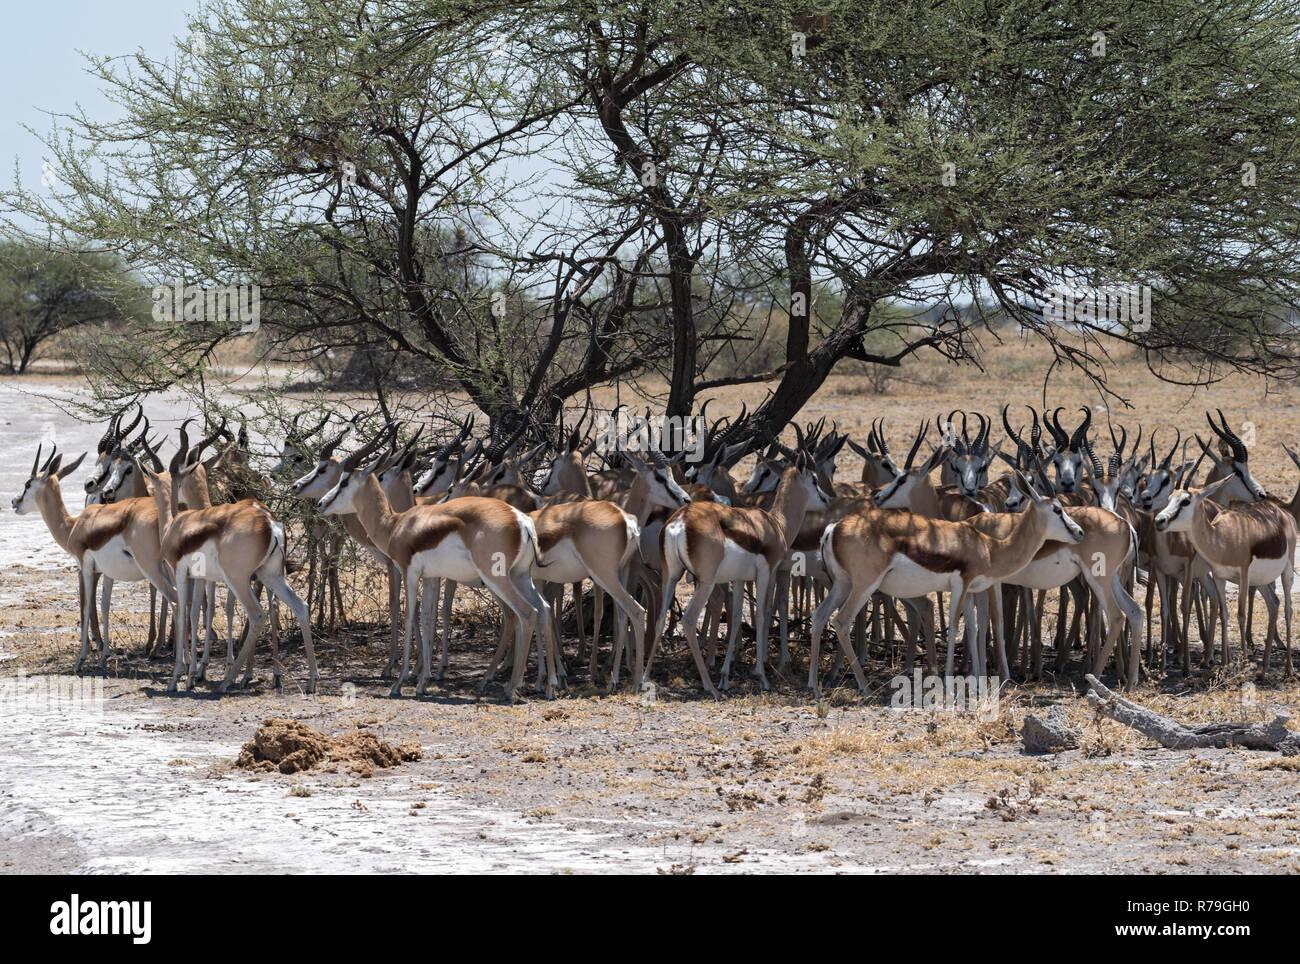 Herd of impala in the shade of a tree in Nxai Pan National Park, Botswana Stock Photo